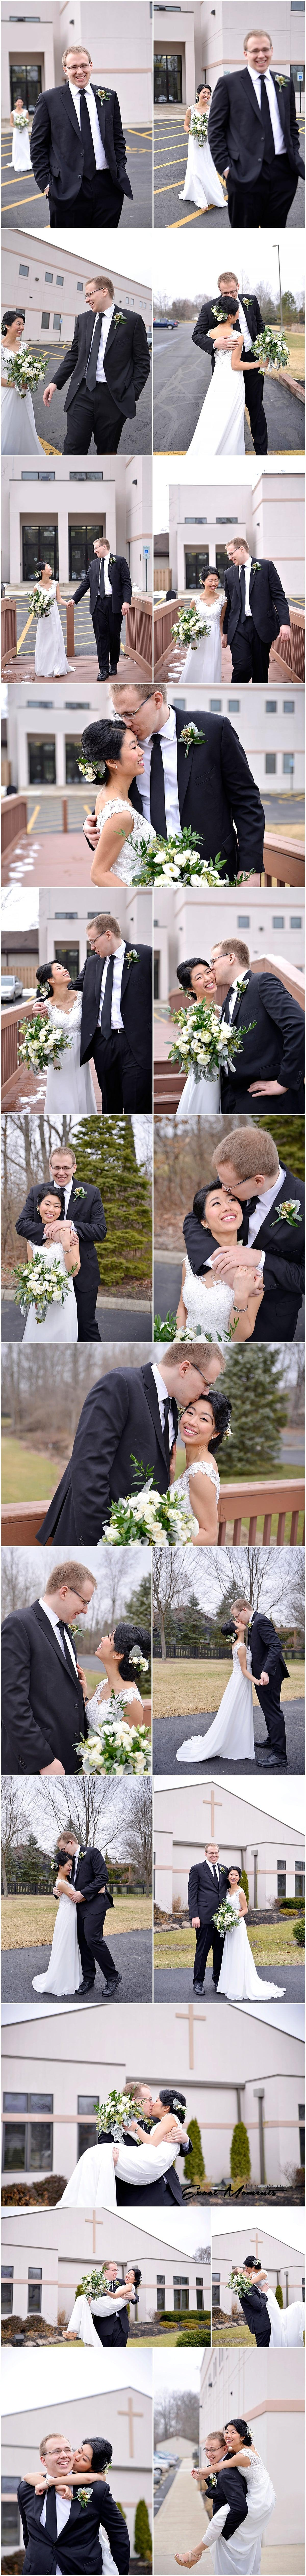 Wedding Photographers Colmbus Ohio